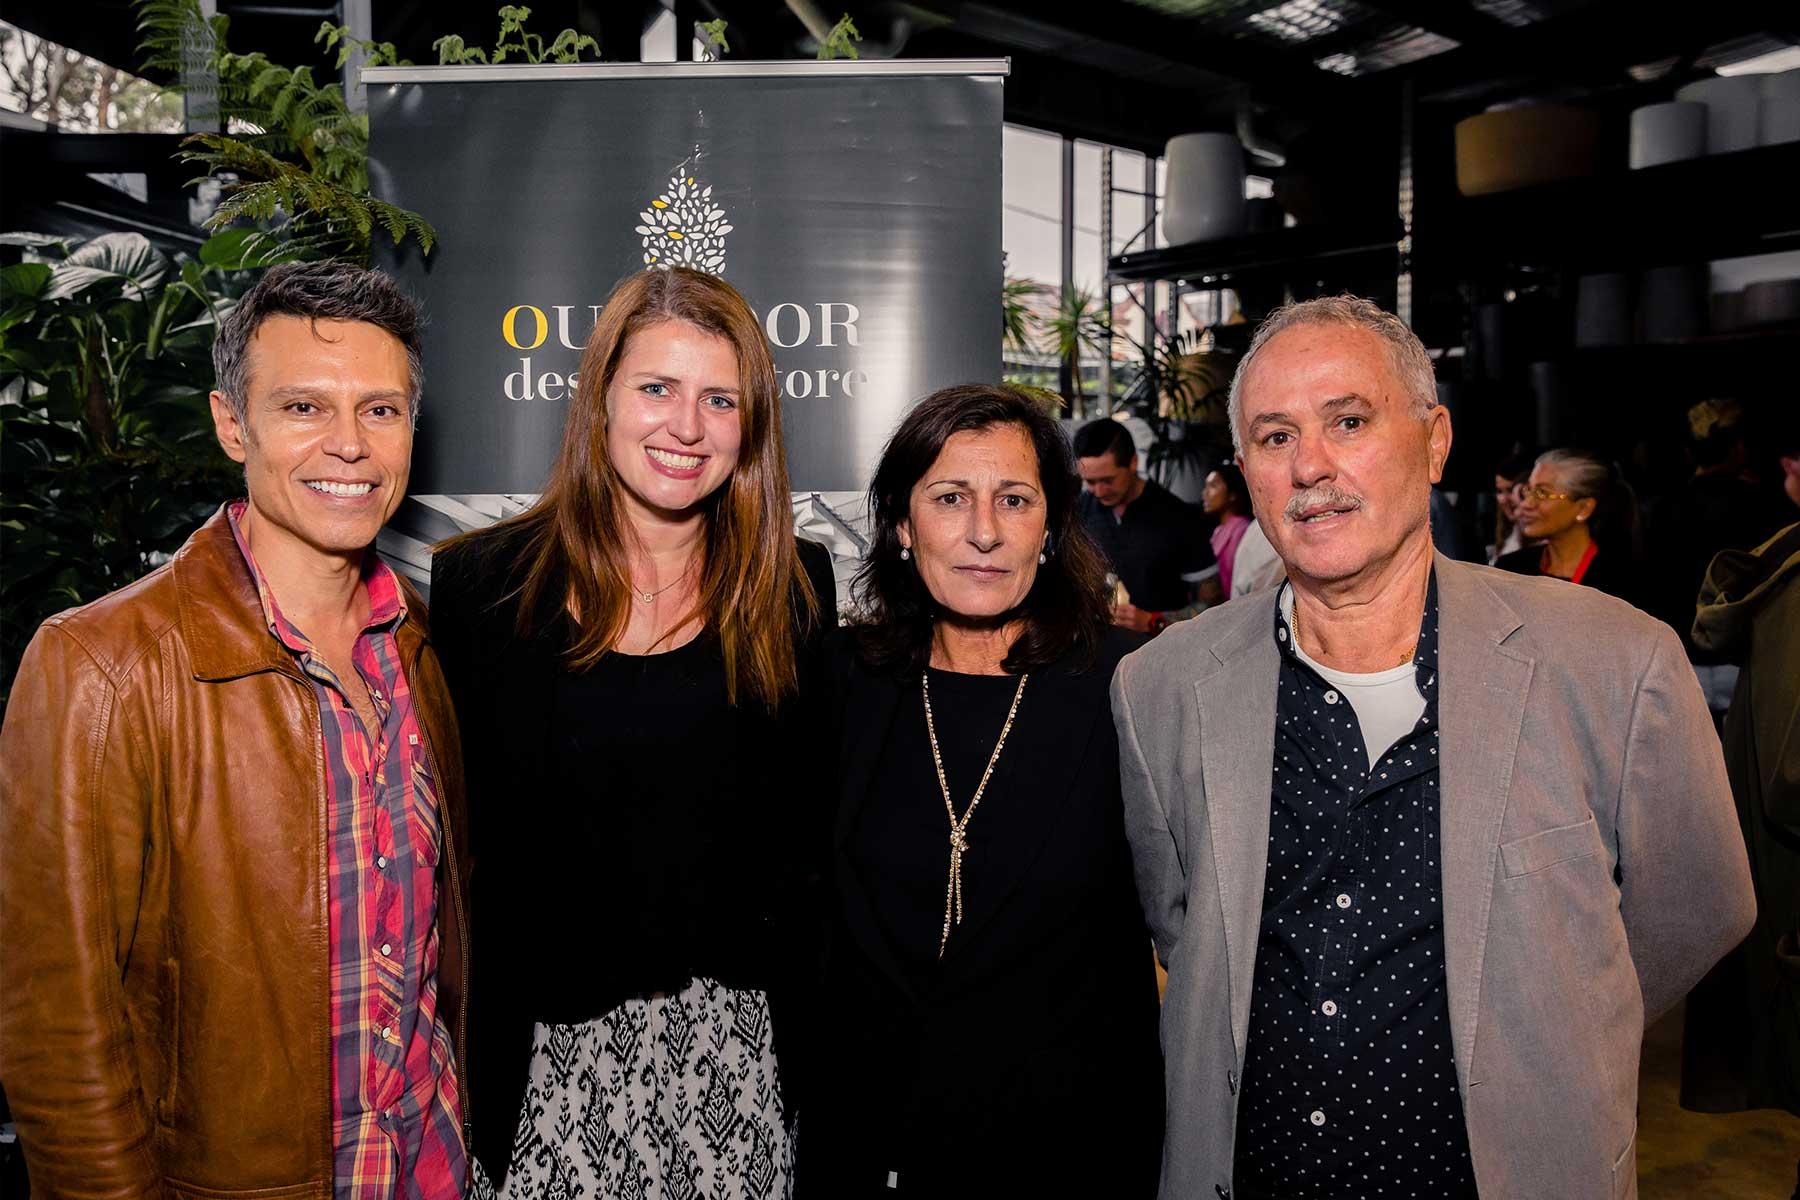 Patryc Lampasi, Alana Sudale, Harriet Condos and Jim Condos from Harbour Outdoor